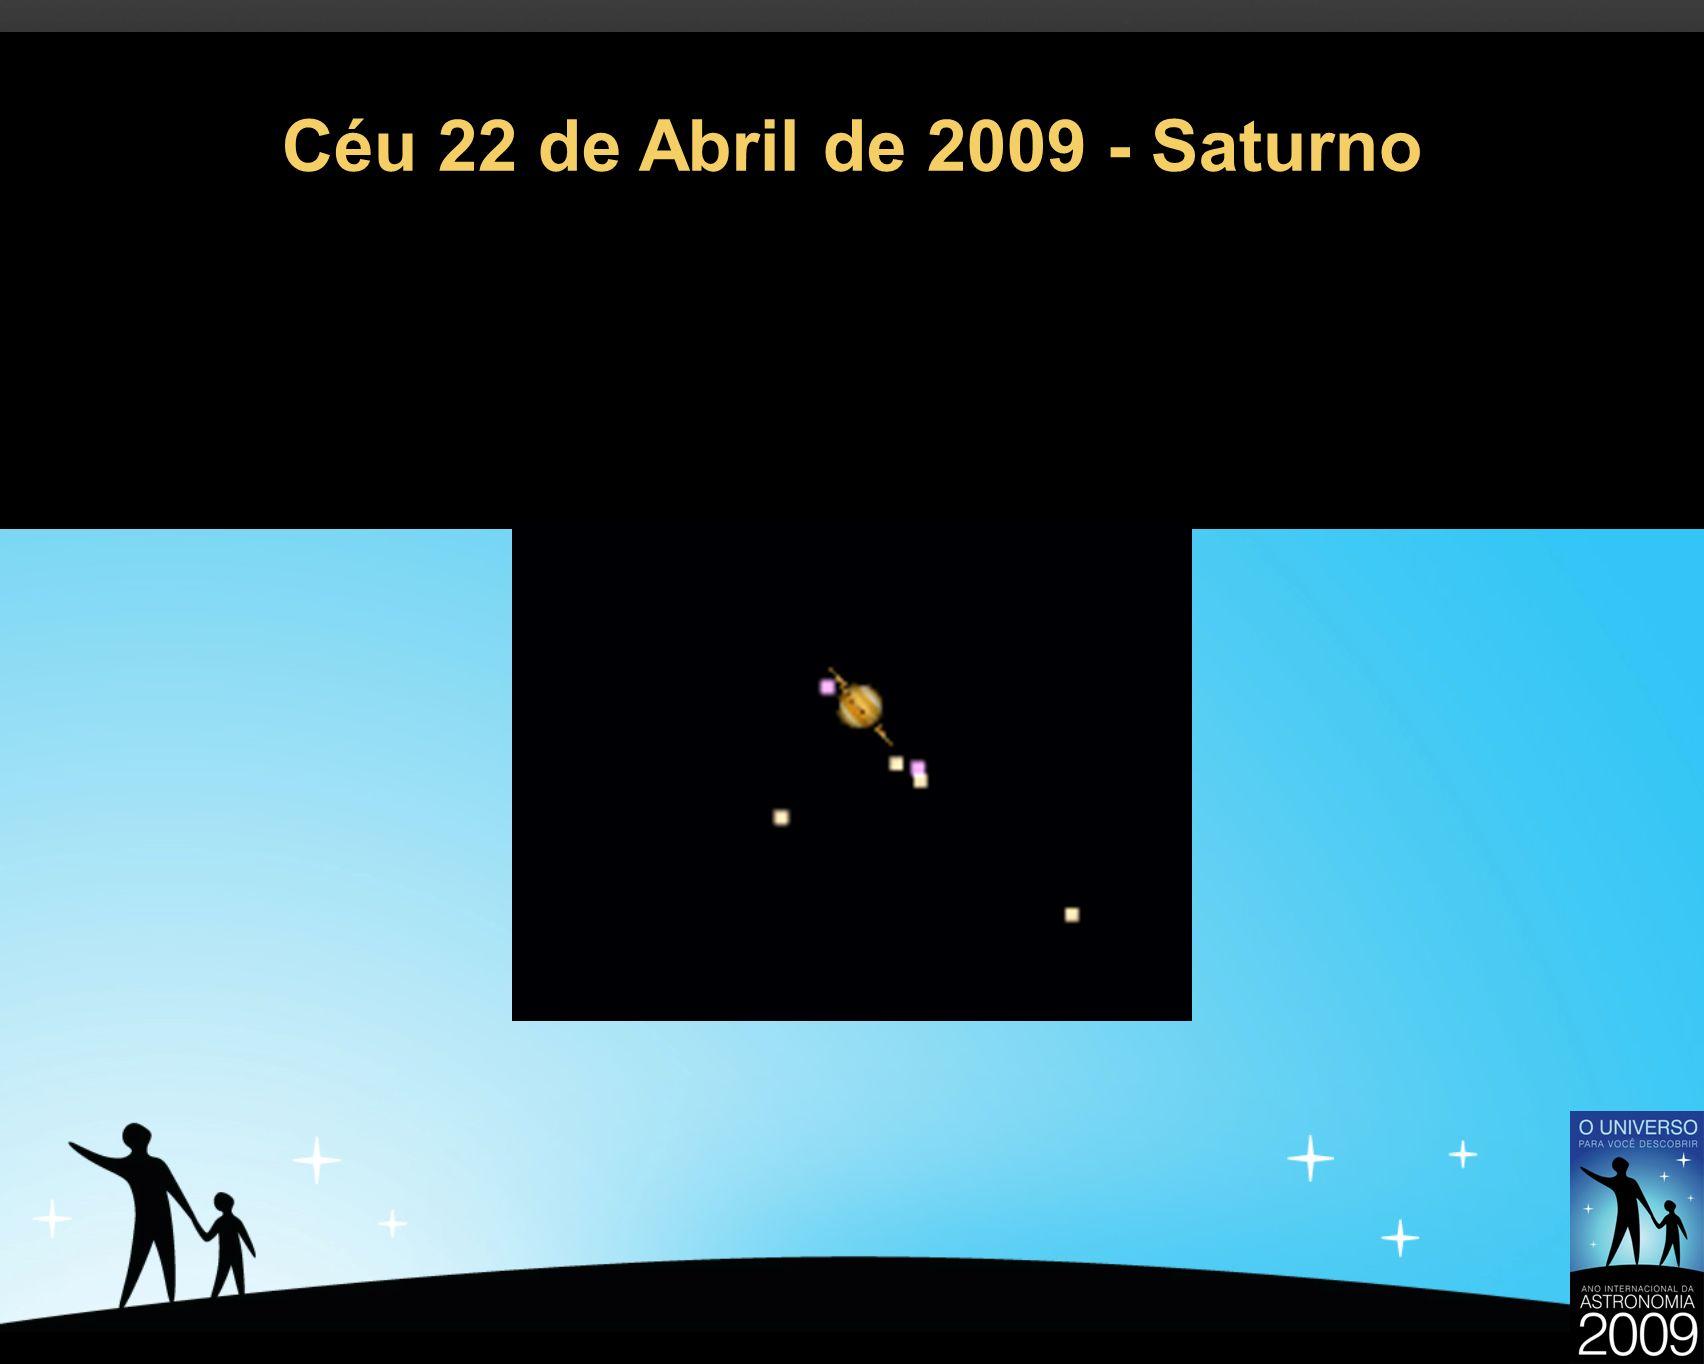 Céu 22 de Abril de 2009 - Saturno